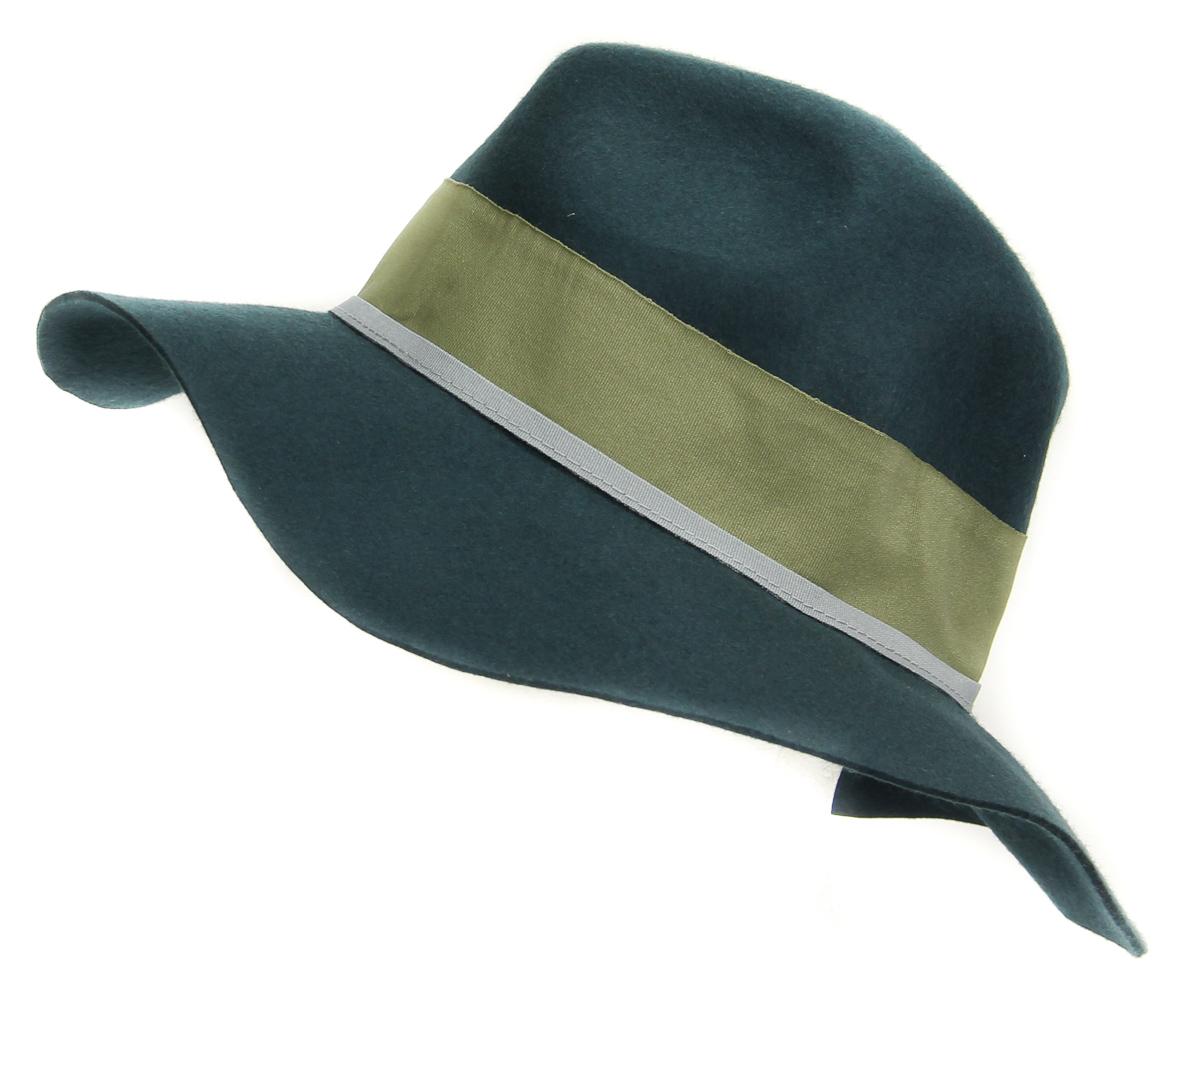 ... Picture 3 of 3. Aqua  HA122219BL Women s Wool Fedora Panama Hat One  Size Indian ... ca78e054e